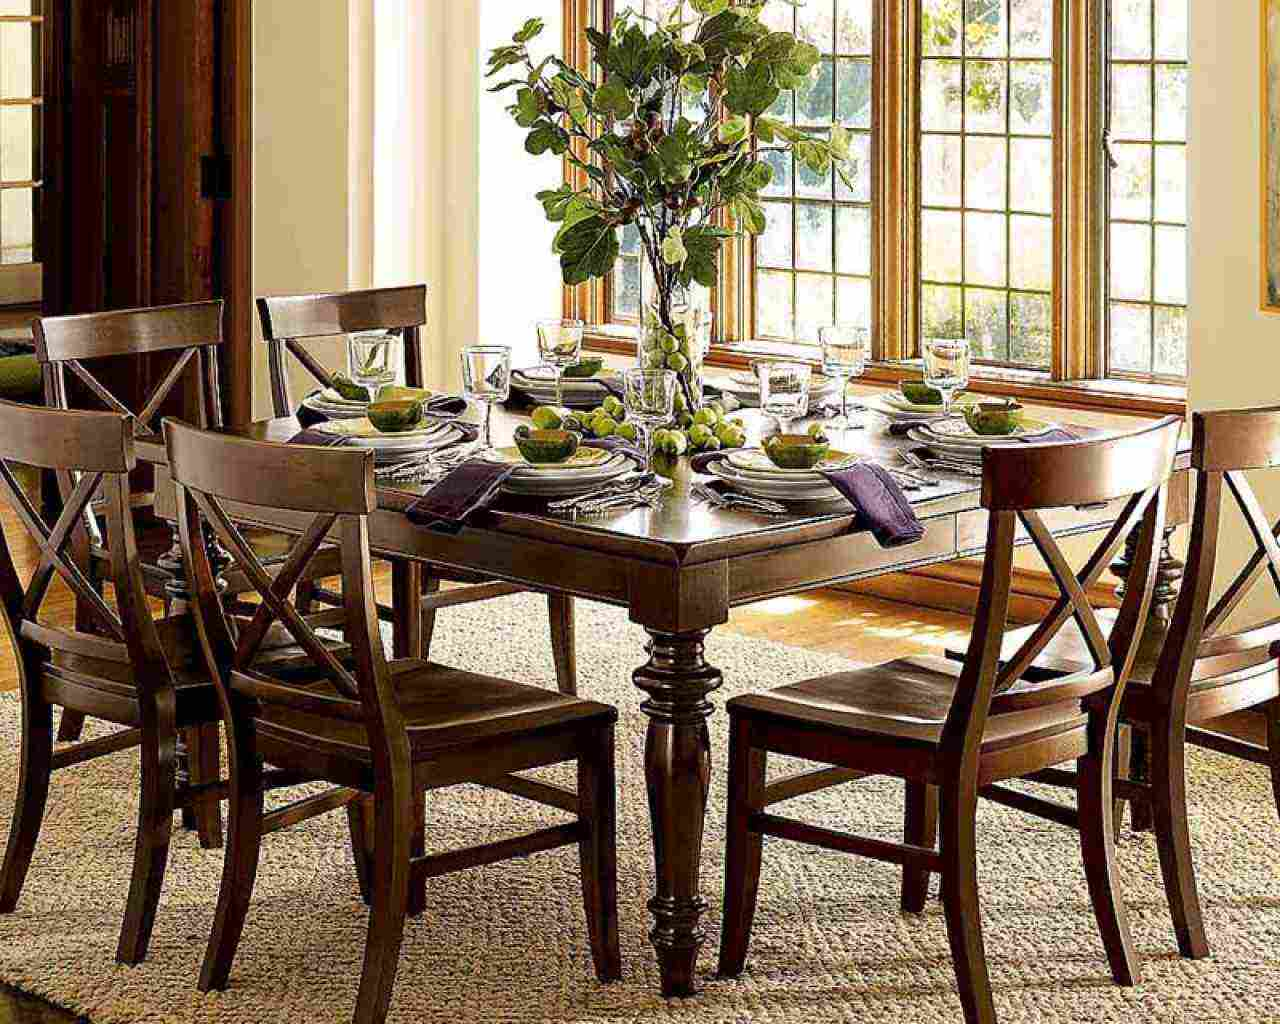 pottery barn dining room chairs decor ideasdecor ideas. Black Bedroom Furniture Sets. Home Design Ideas